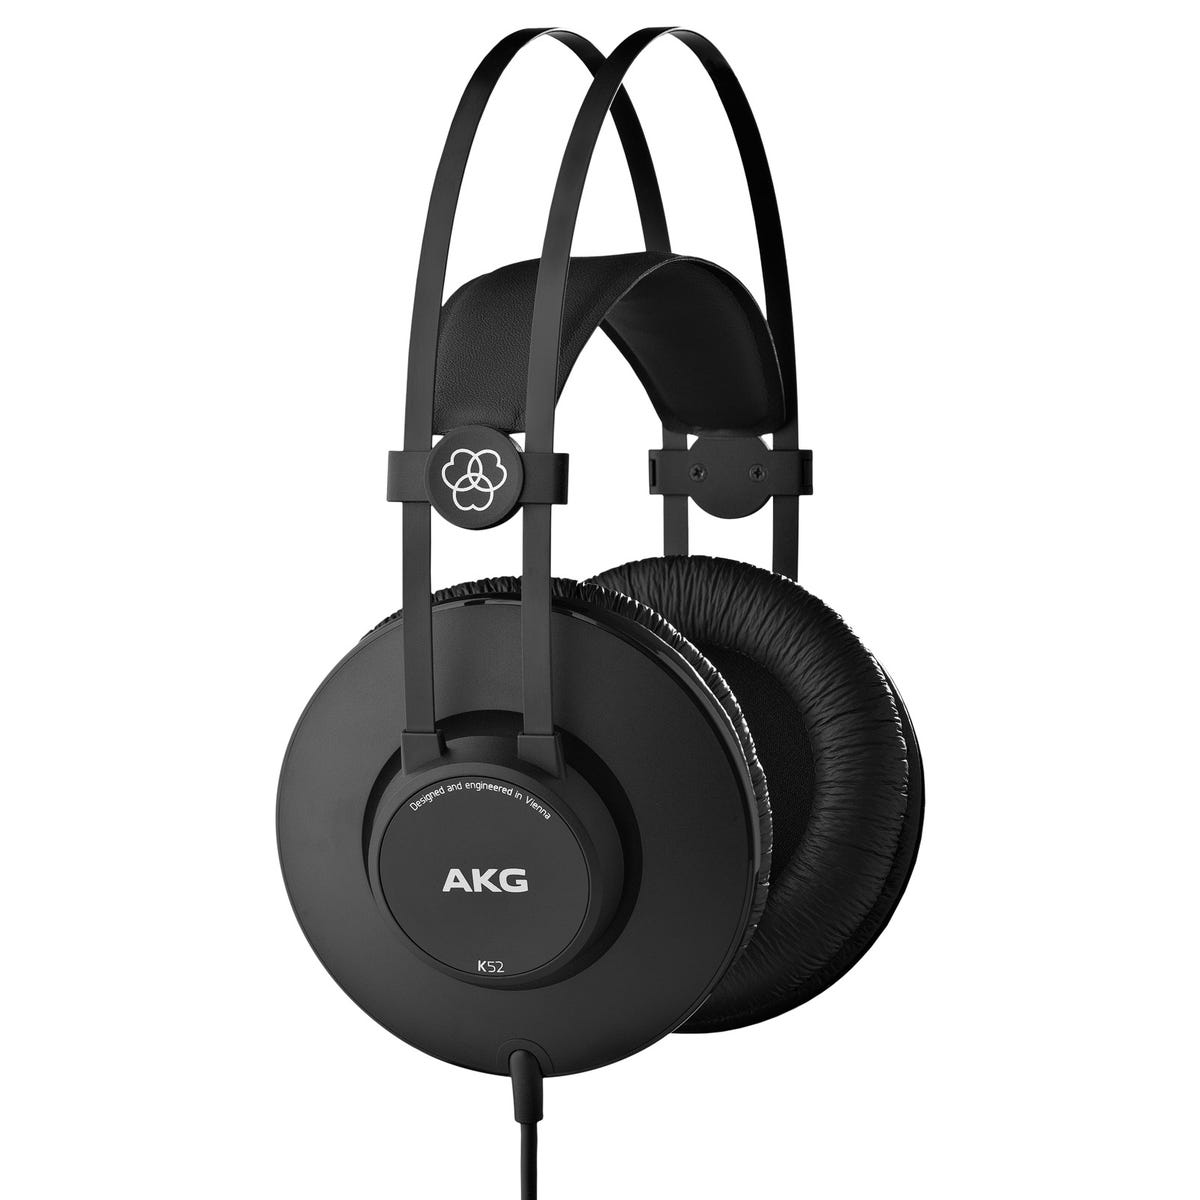 AKG Professional K52 Headphones